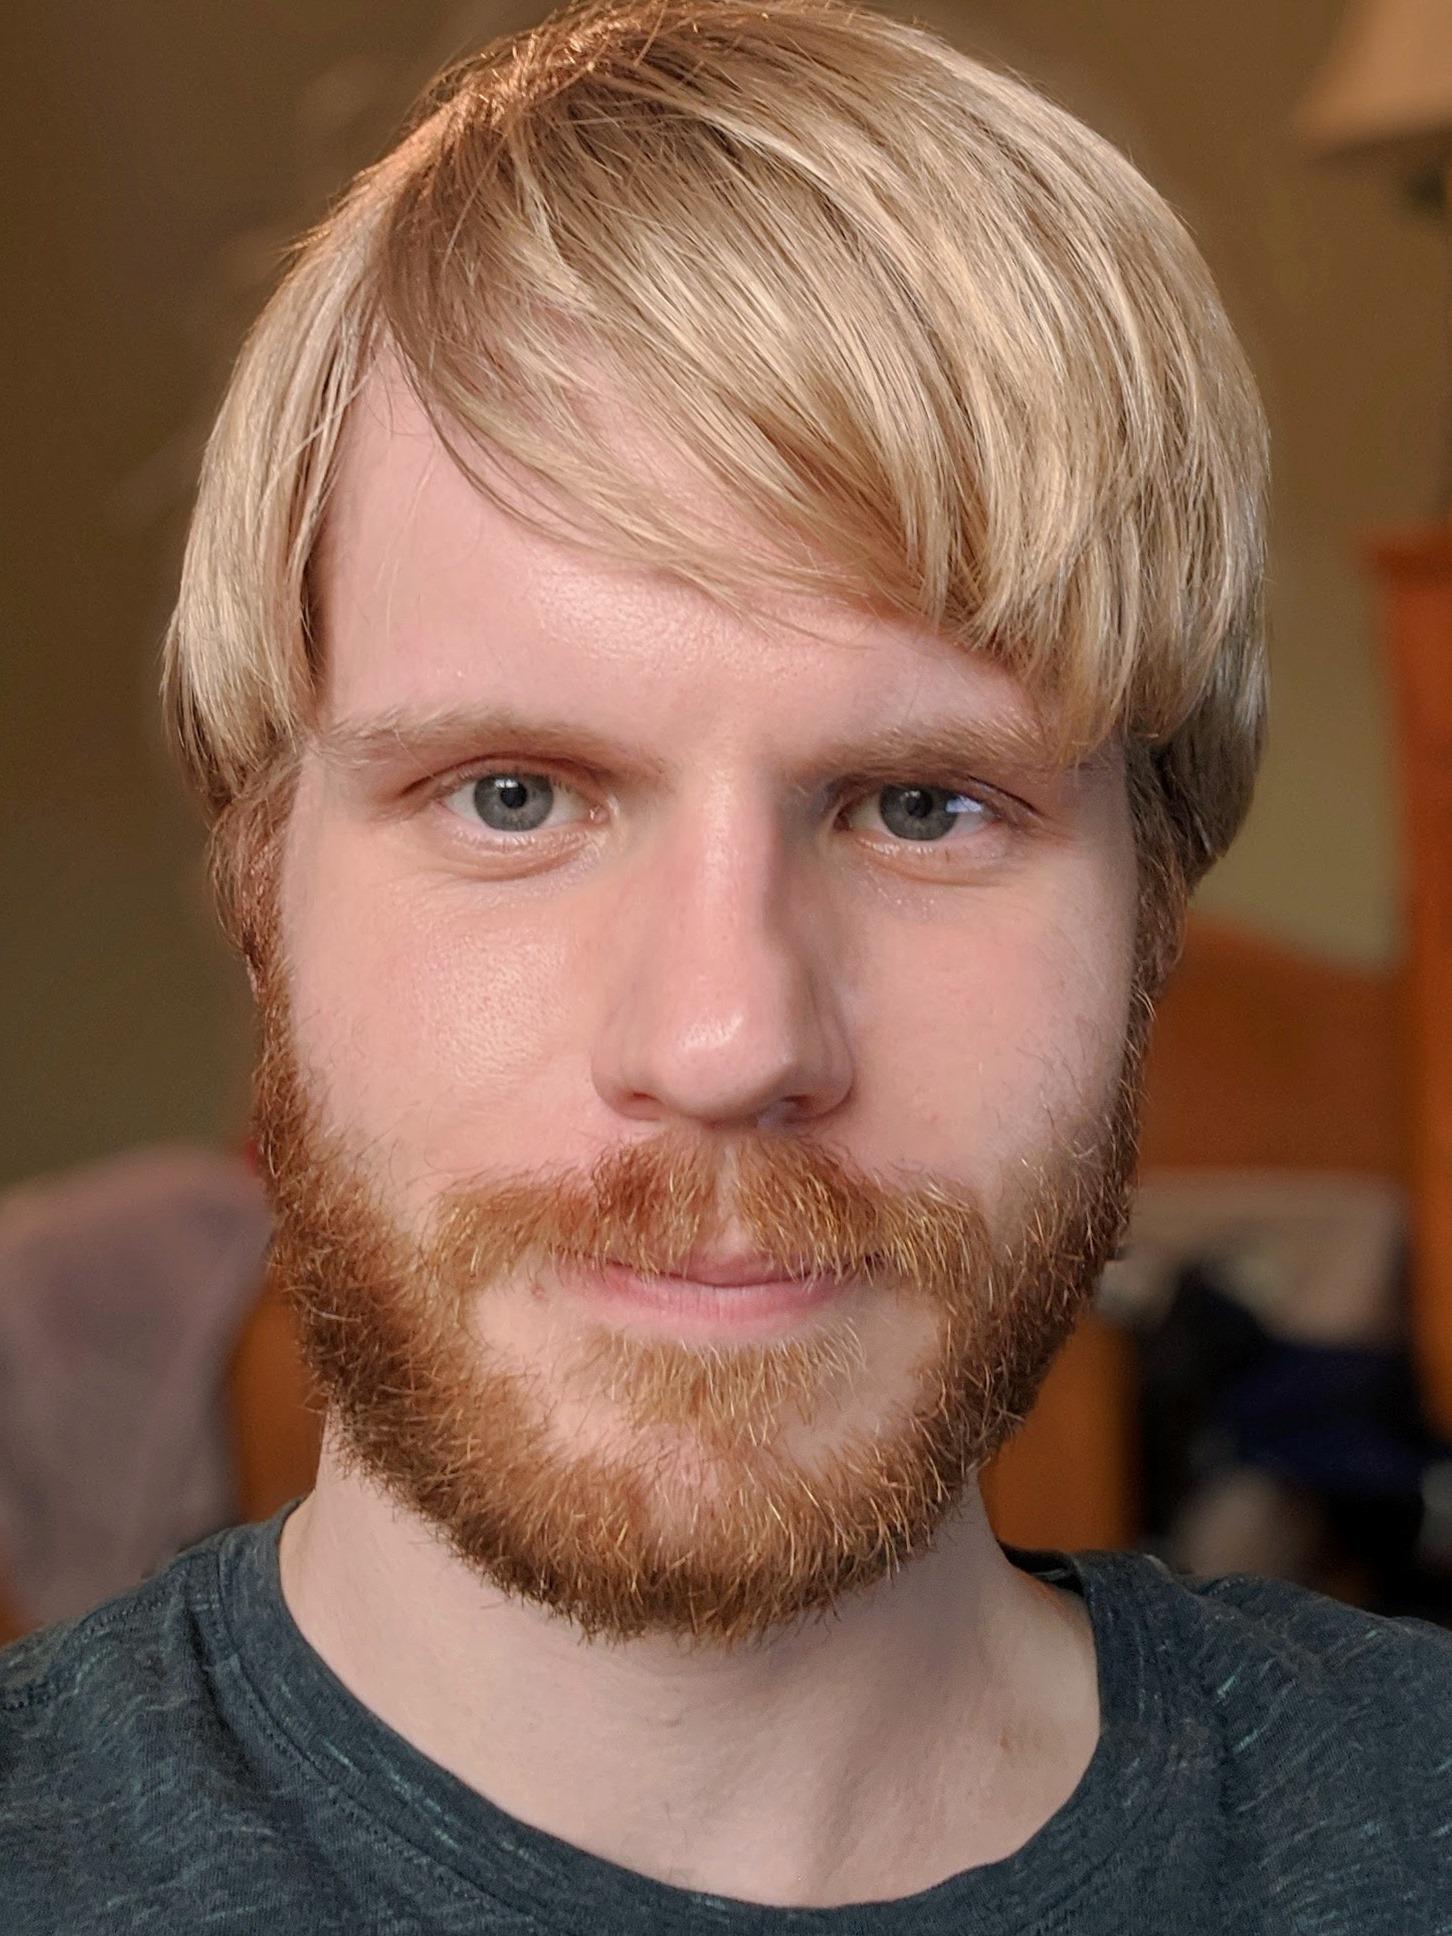 12.Justin Beard 2